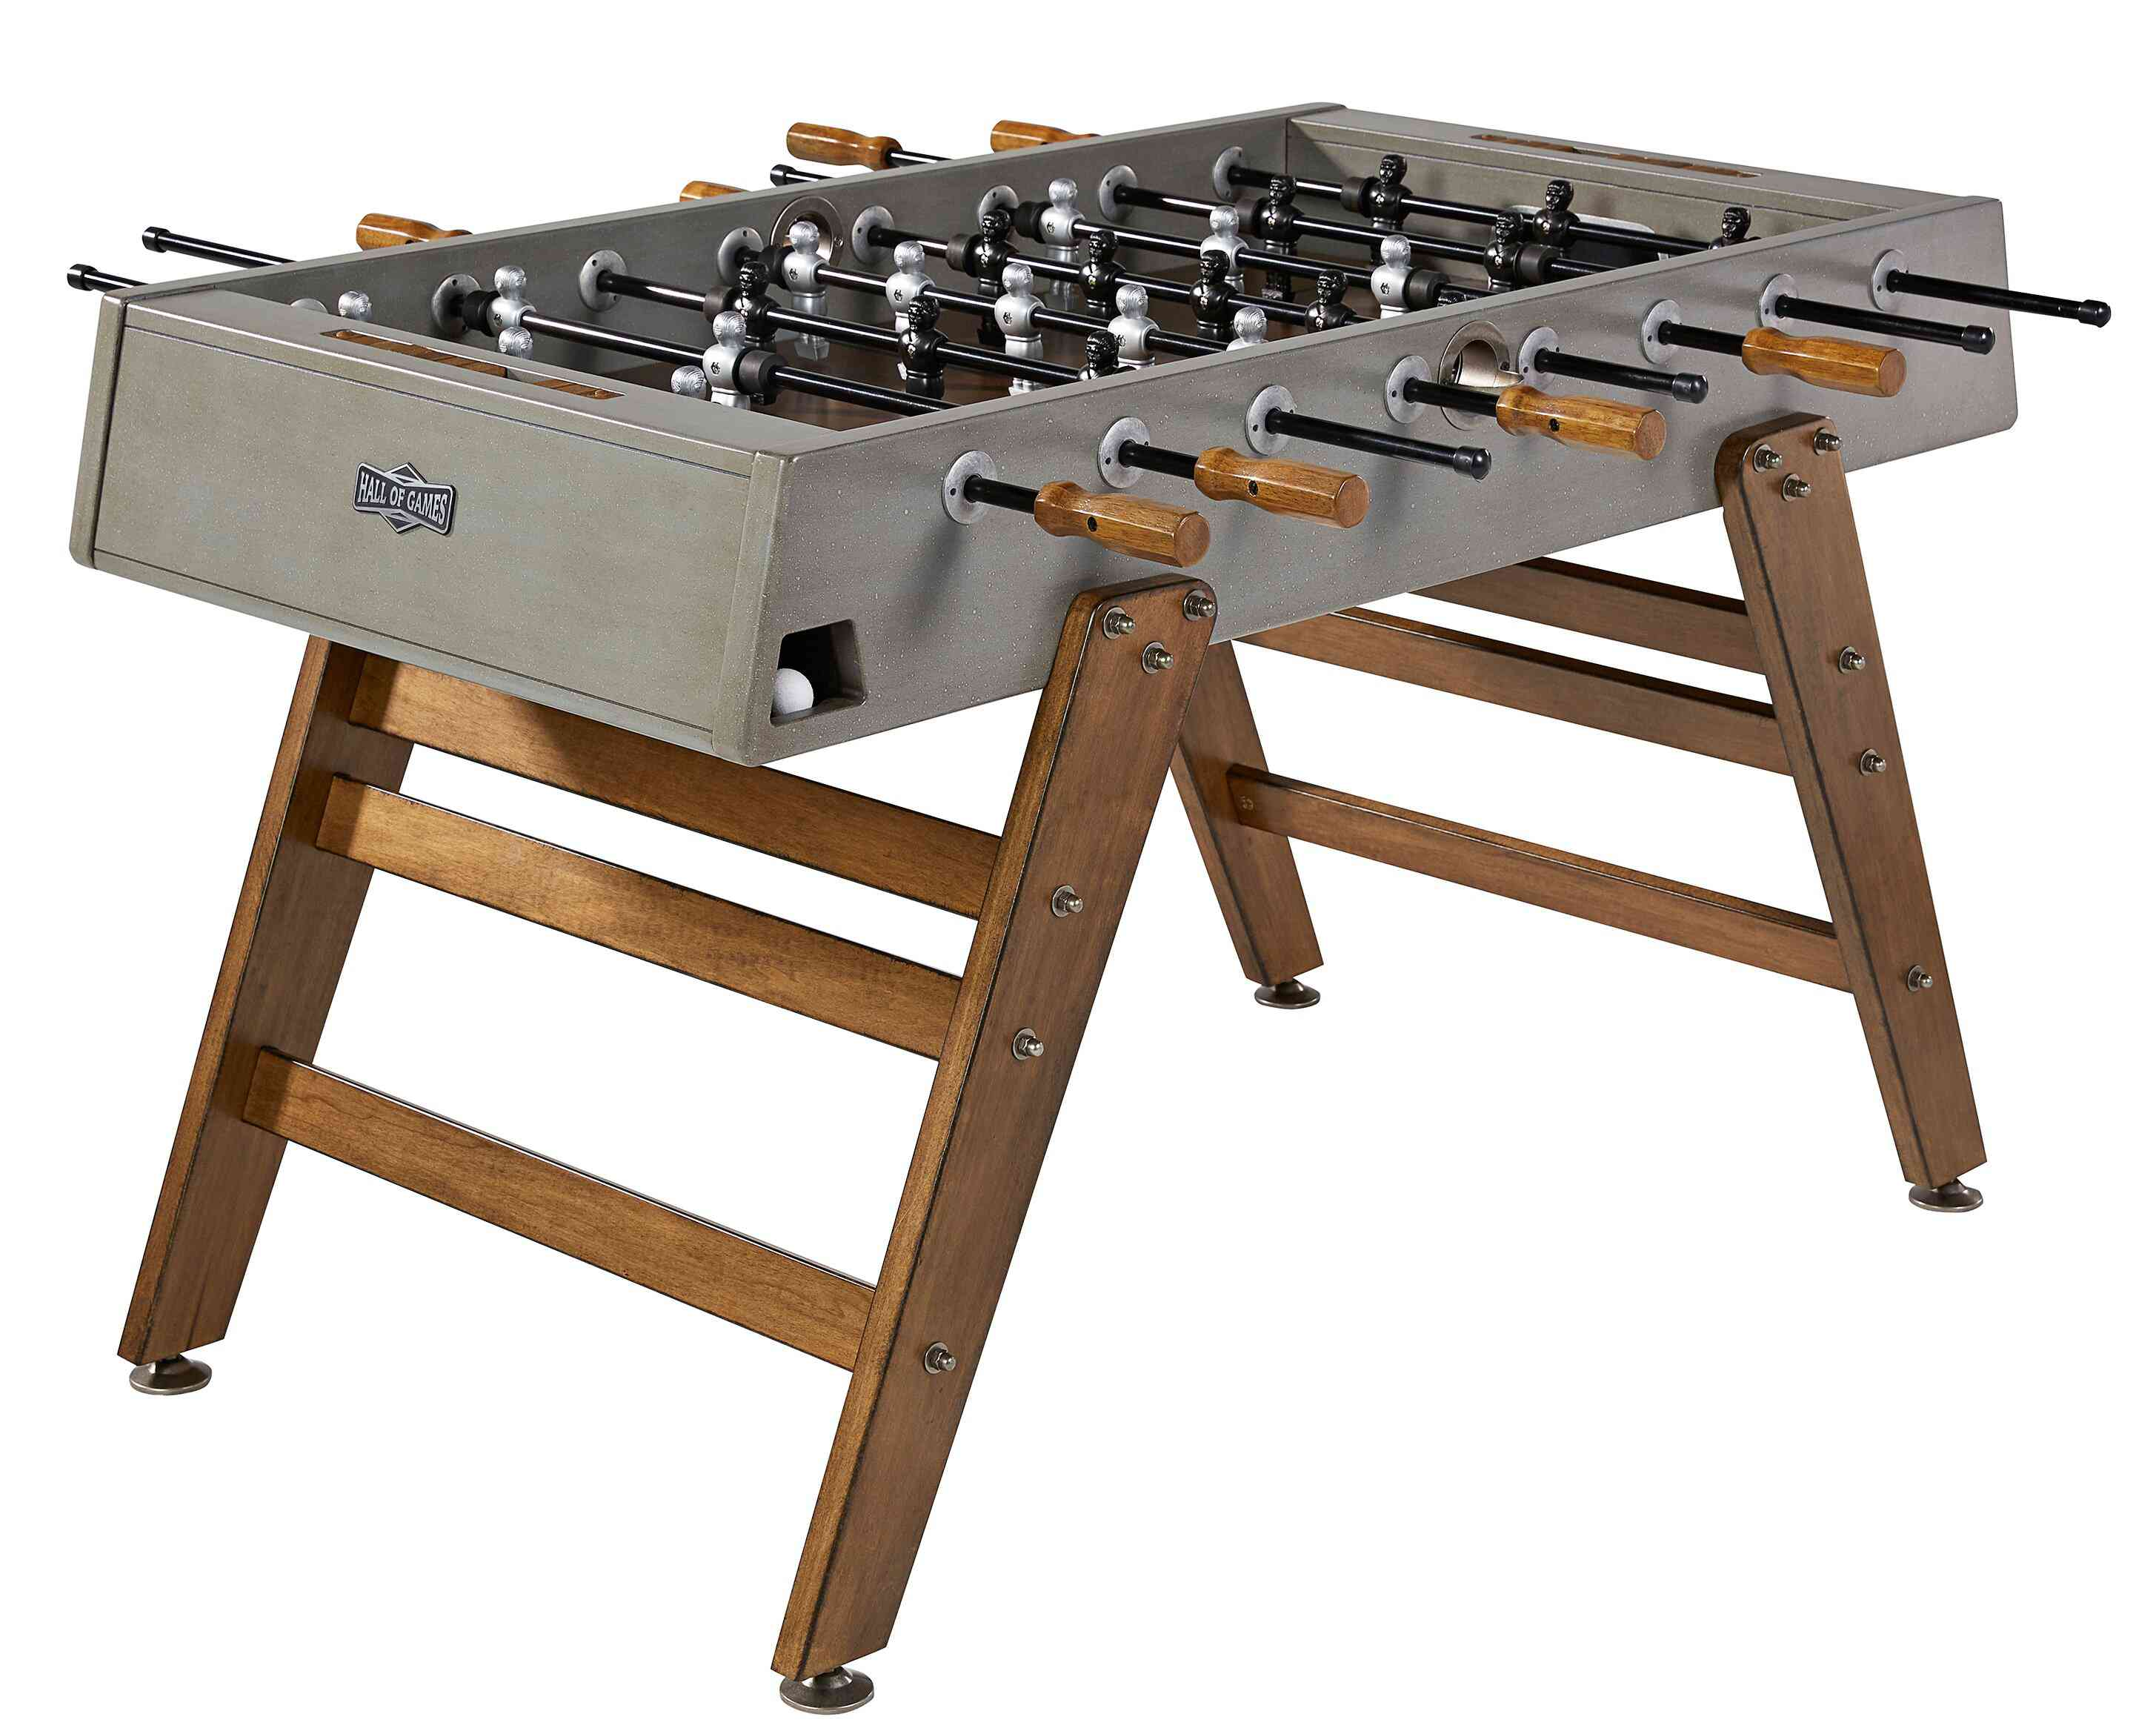 "Hall of Games Kinwood 56"" Foosball Table"